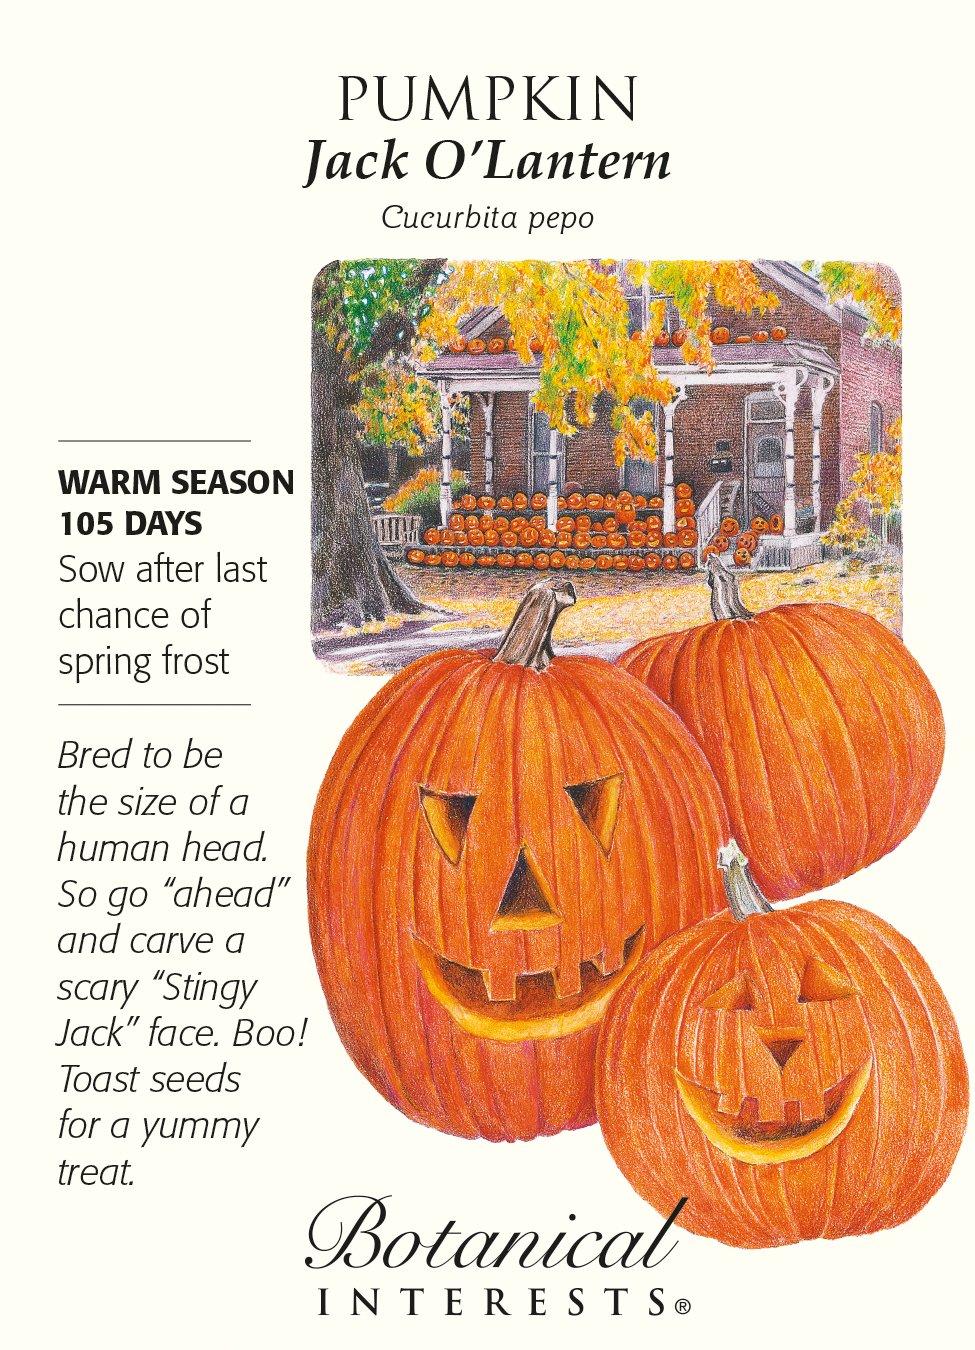 Jack O'Lantern Pumpkin Seeds - 6.5 grams by Hirts: Seed; Pumpkin (Image #1)